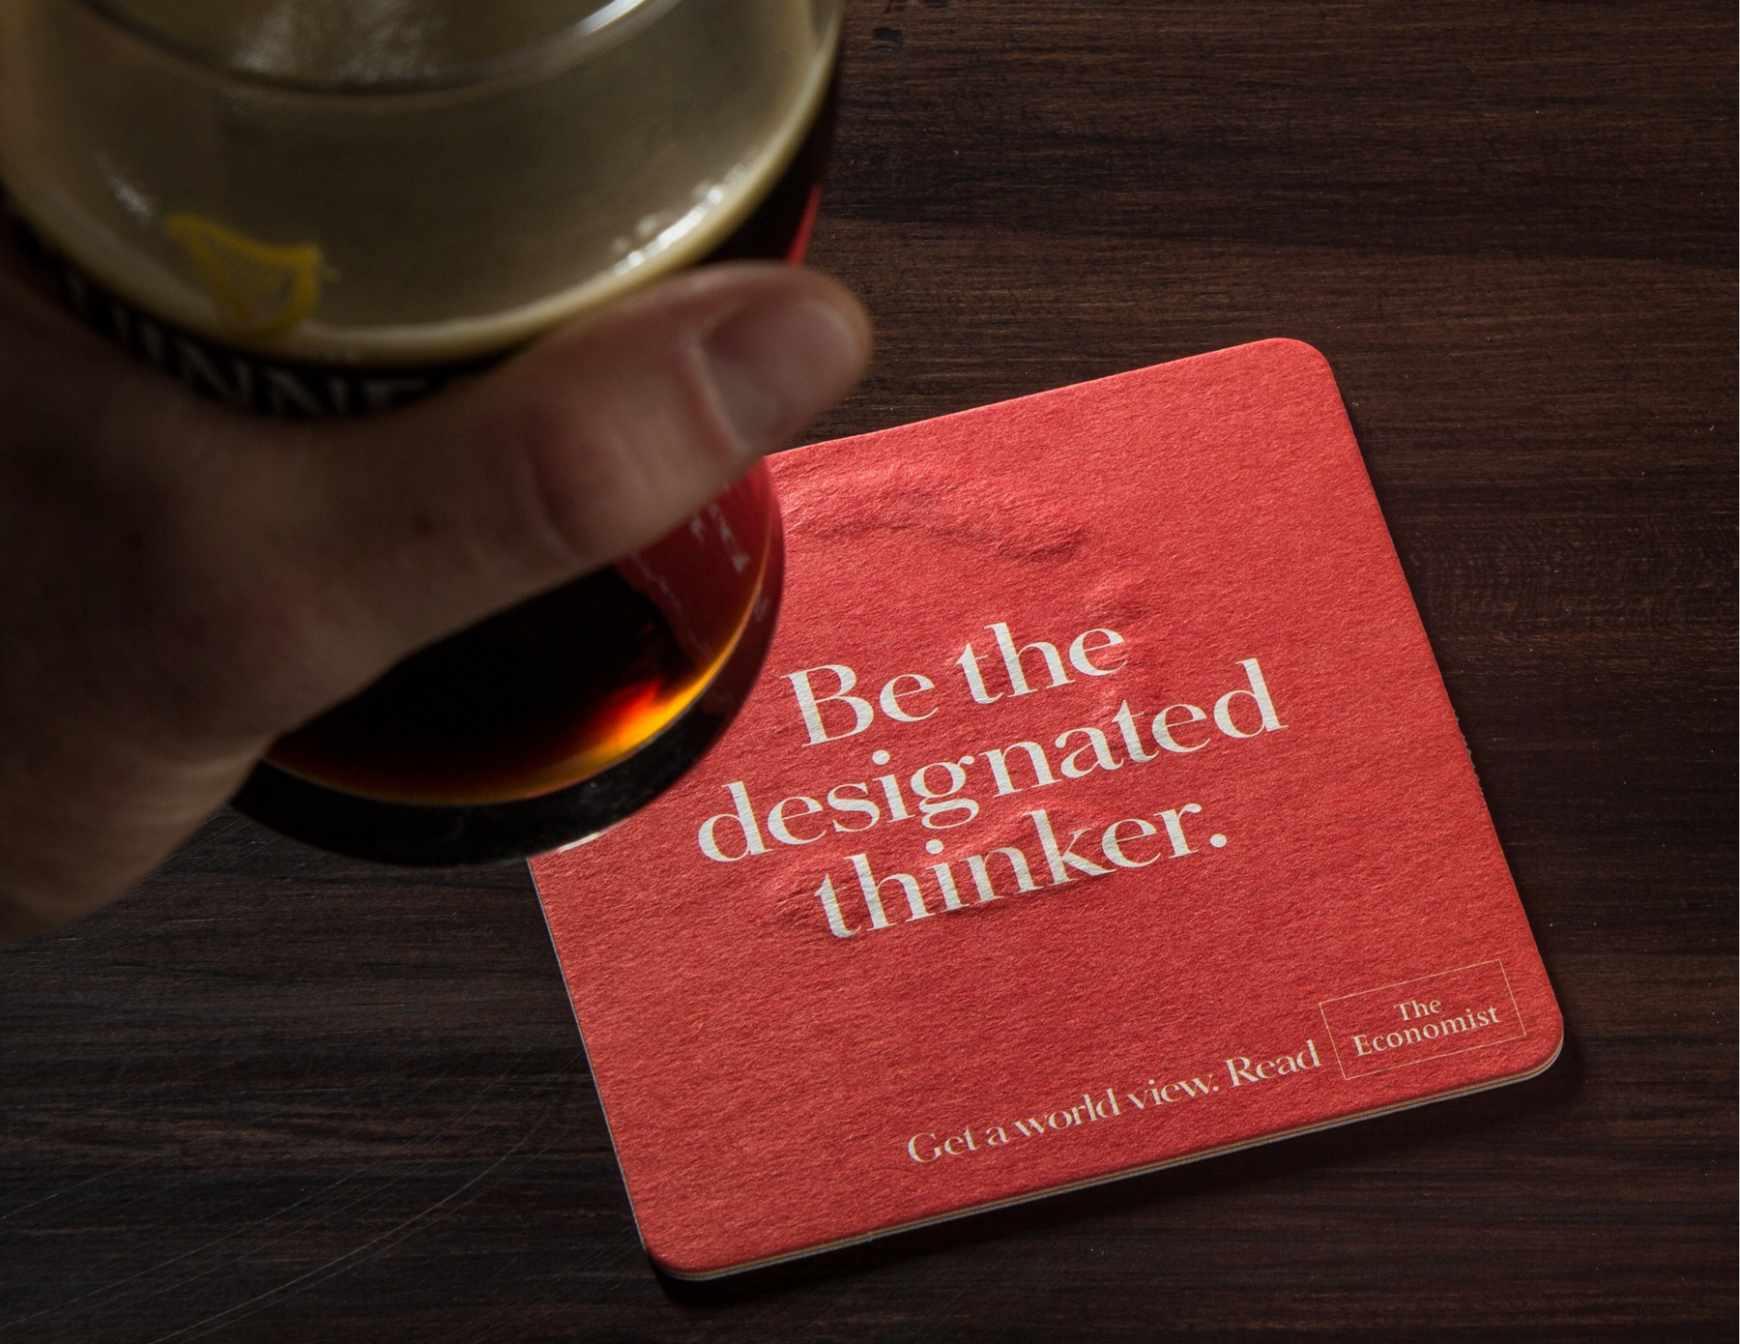 eco_designated_thinker_aotw